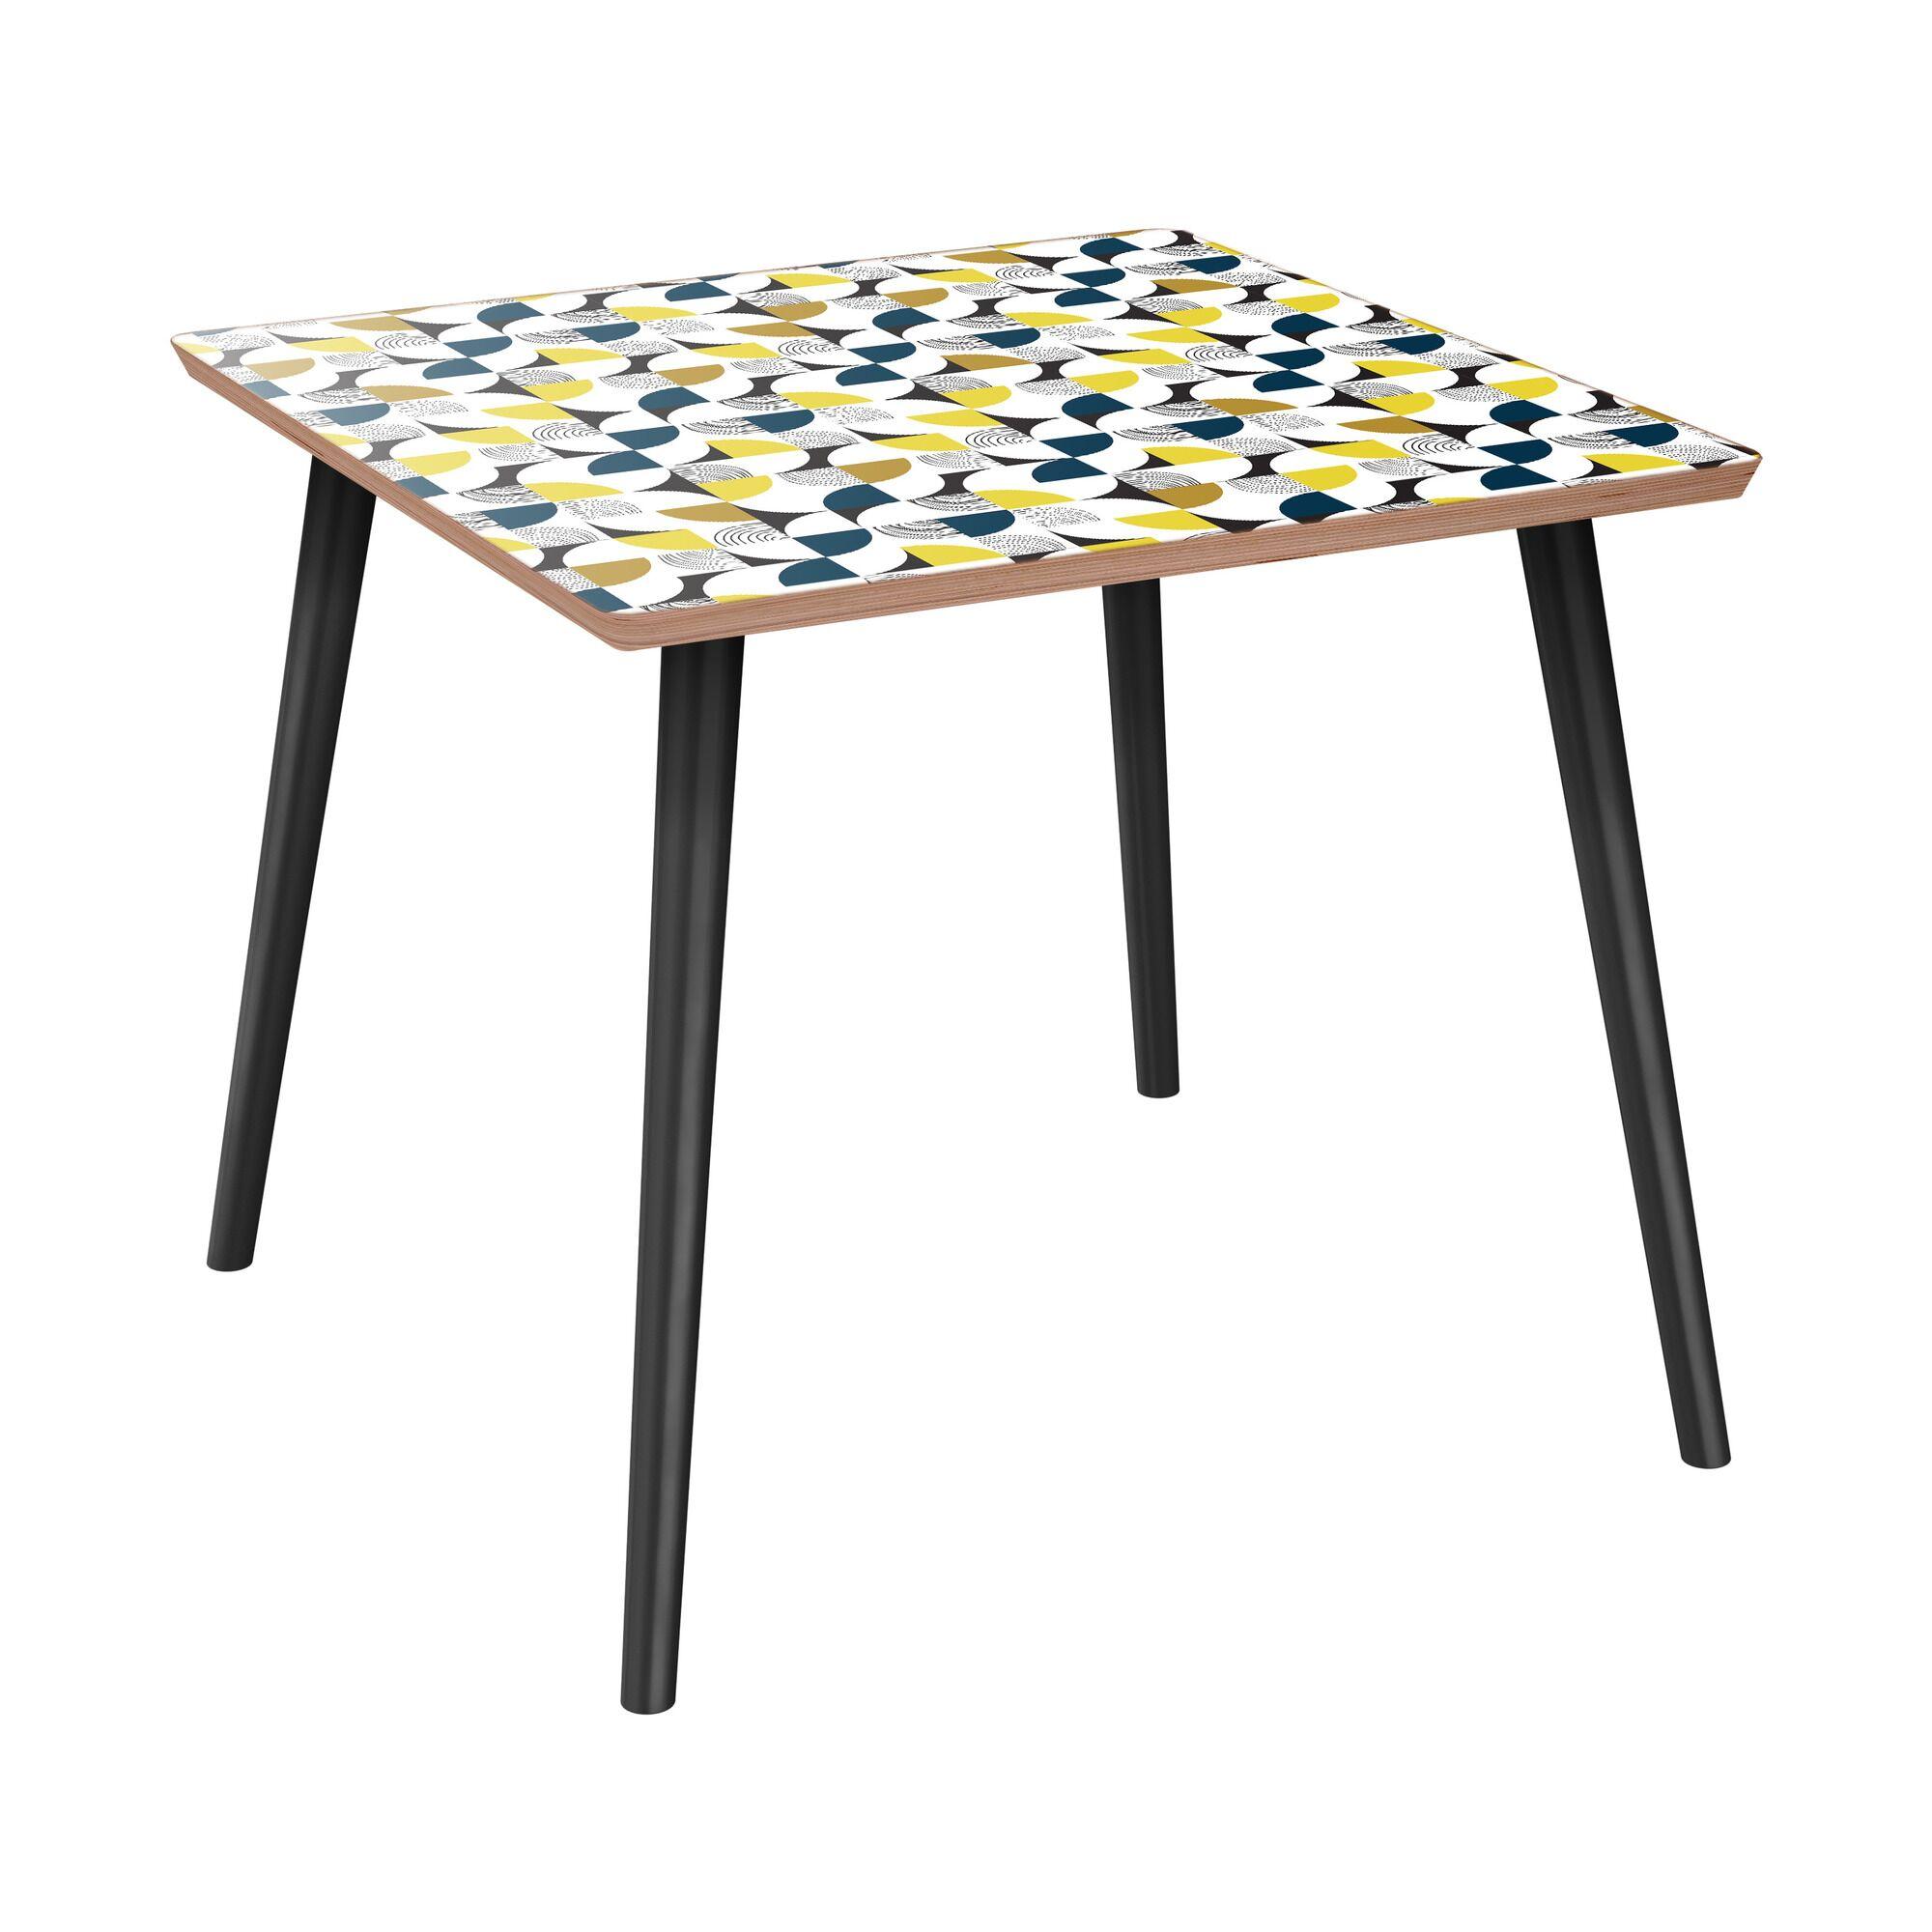 Schaffner End Table Table Base Color: Black, Table Top Color: Walnut